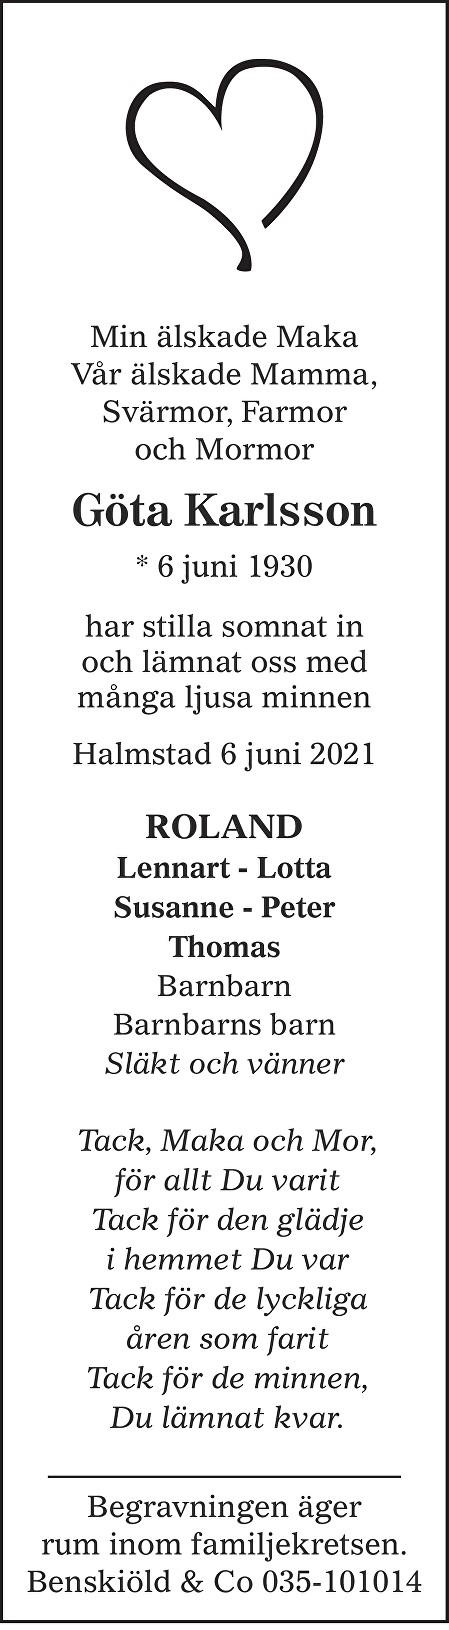 Göta Karlsson Death notice